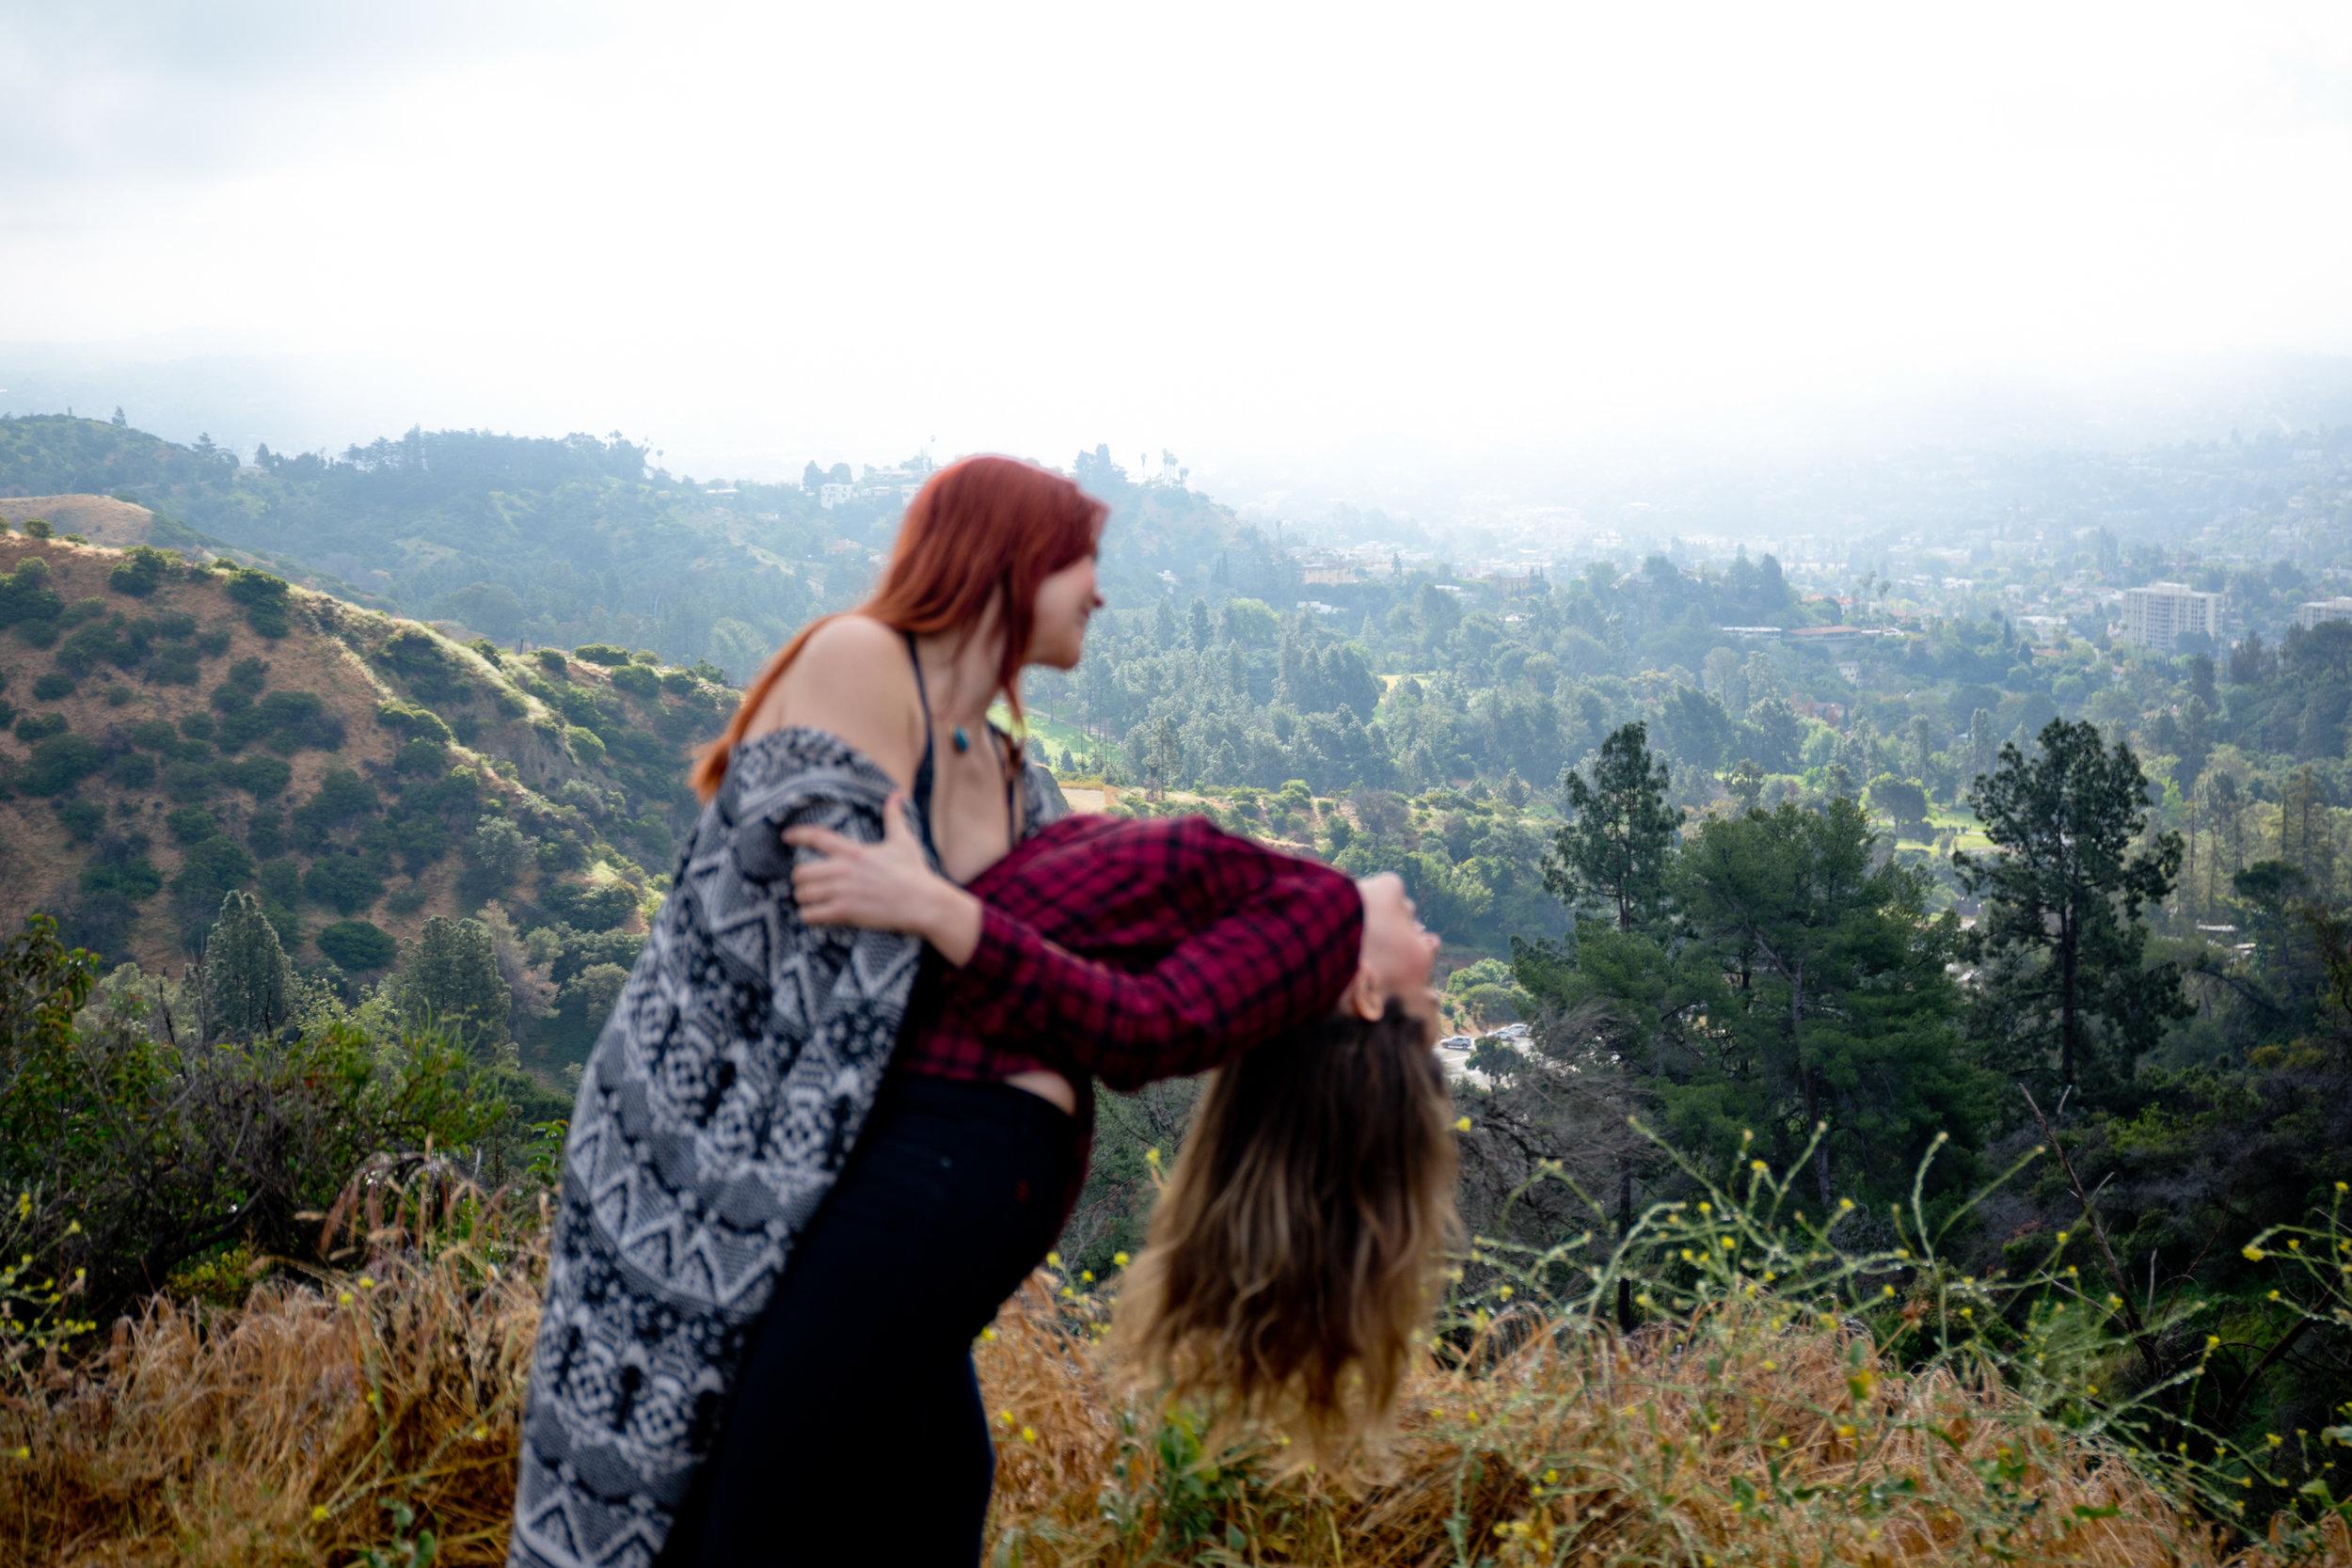 CarlyGaebe_SteadfastStudio_TierneyCourtney_Engagement_GriffithPark_Observatory_LosAngeles_LA_California_Wedding_LGBTQ_Lesbian_Dawn_SilverLake86.JPG